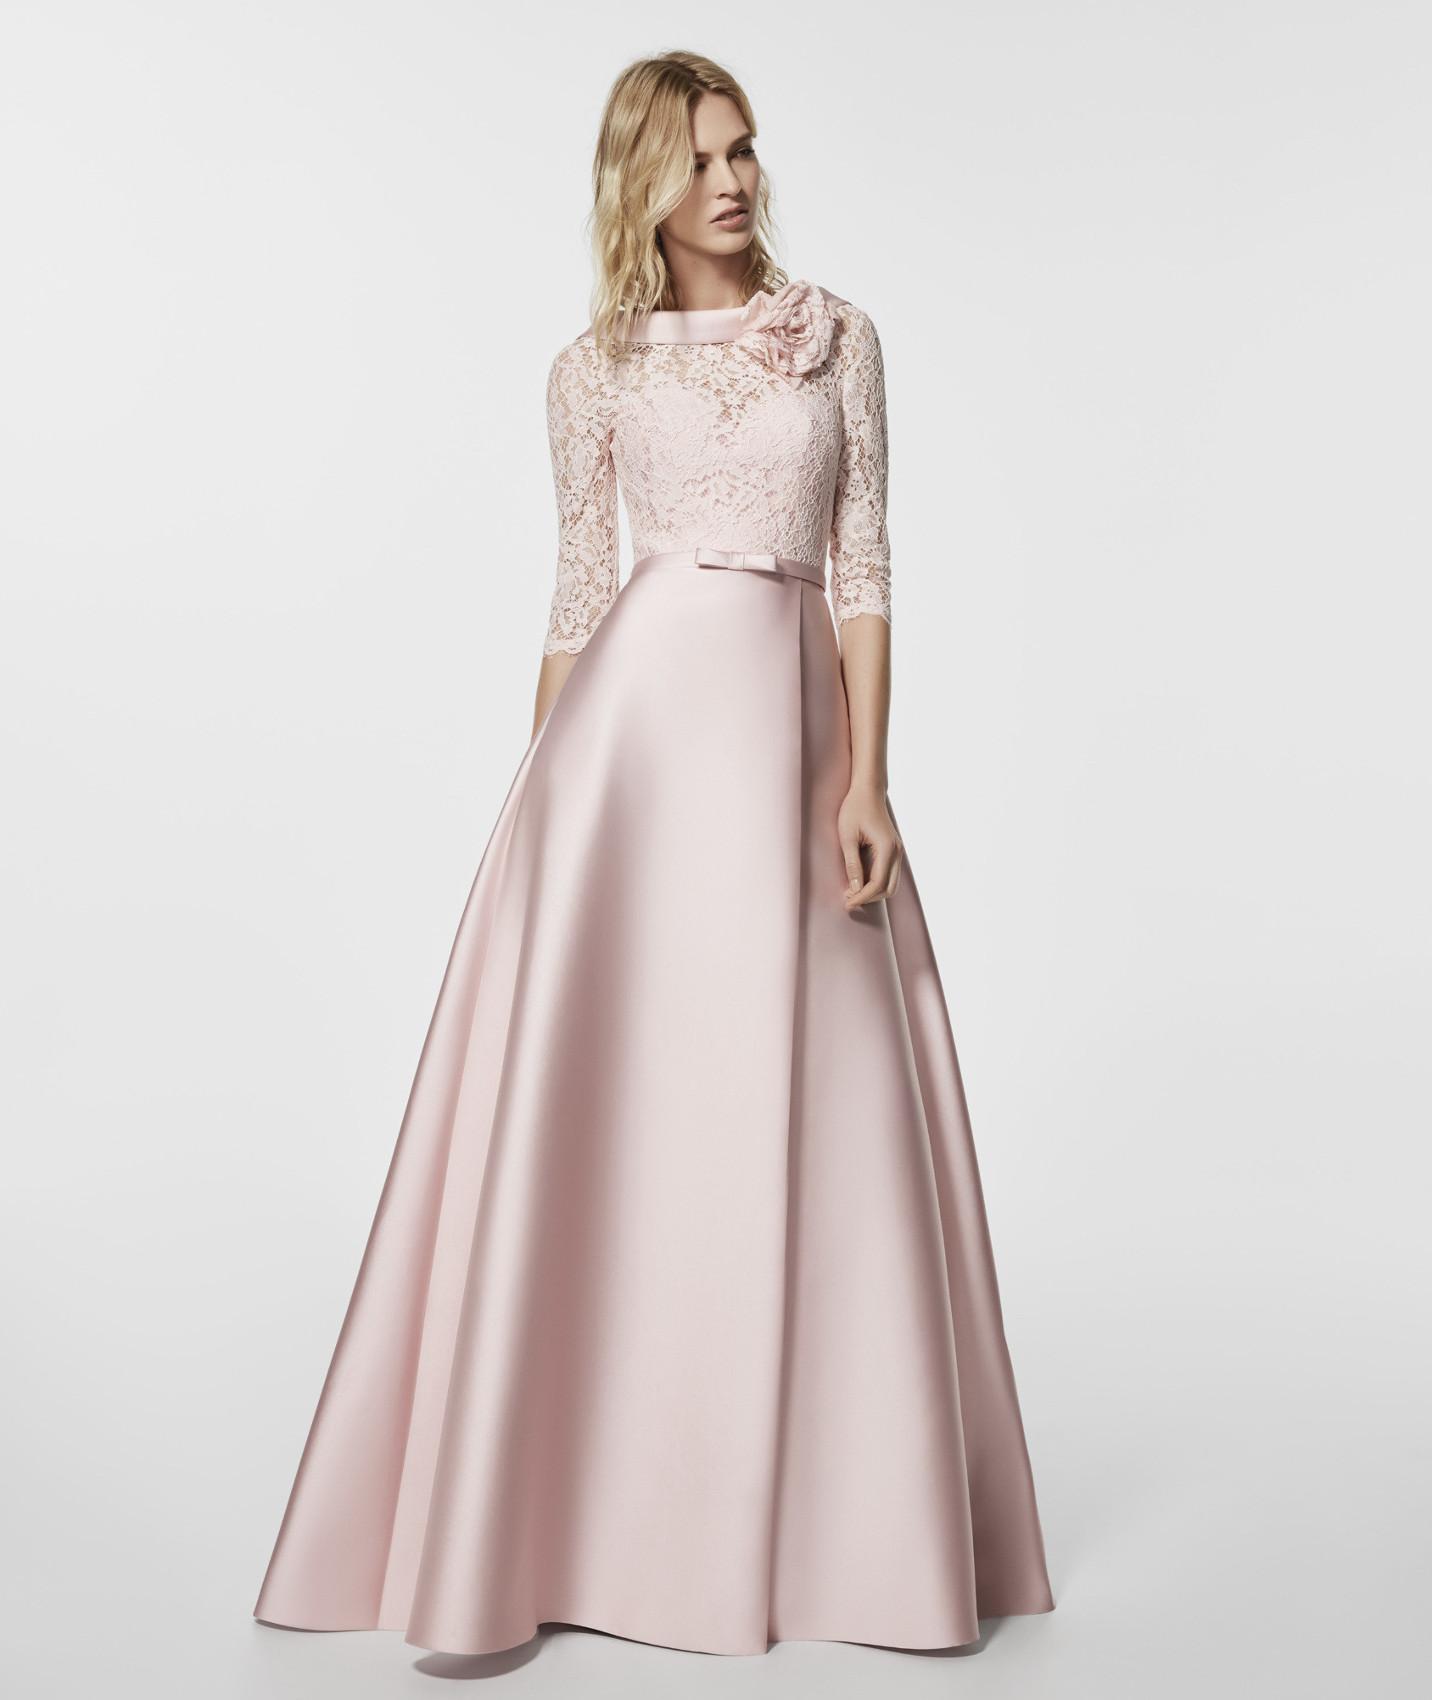 Glorymar evening dress